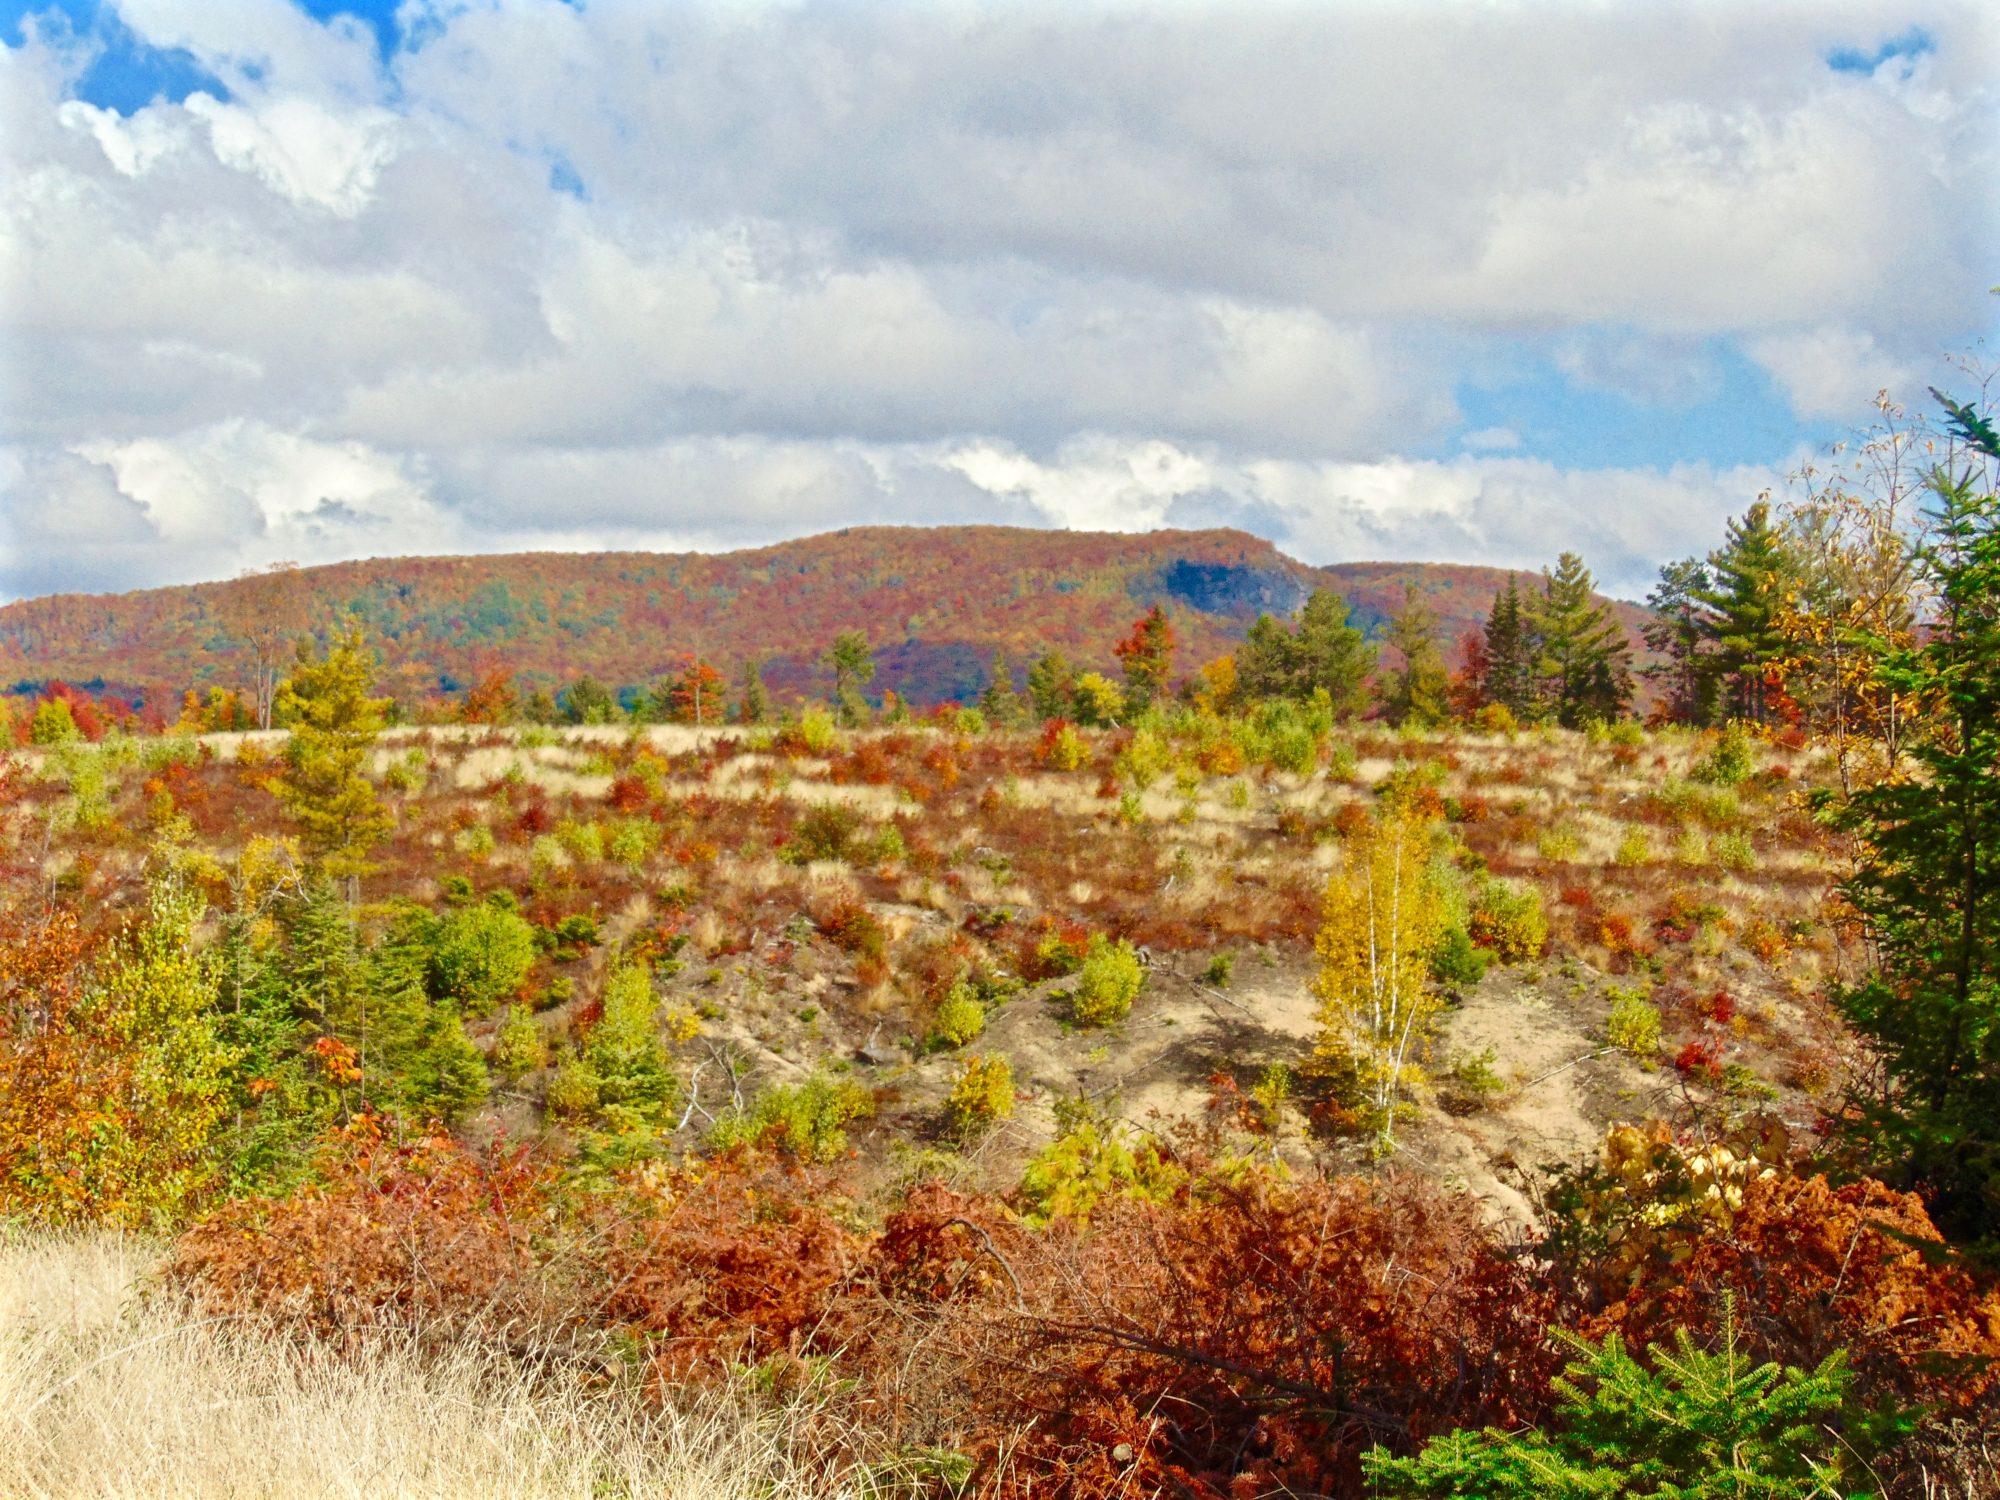 Adirondack land